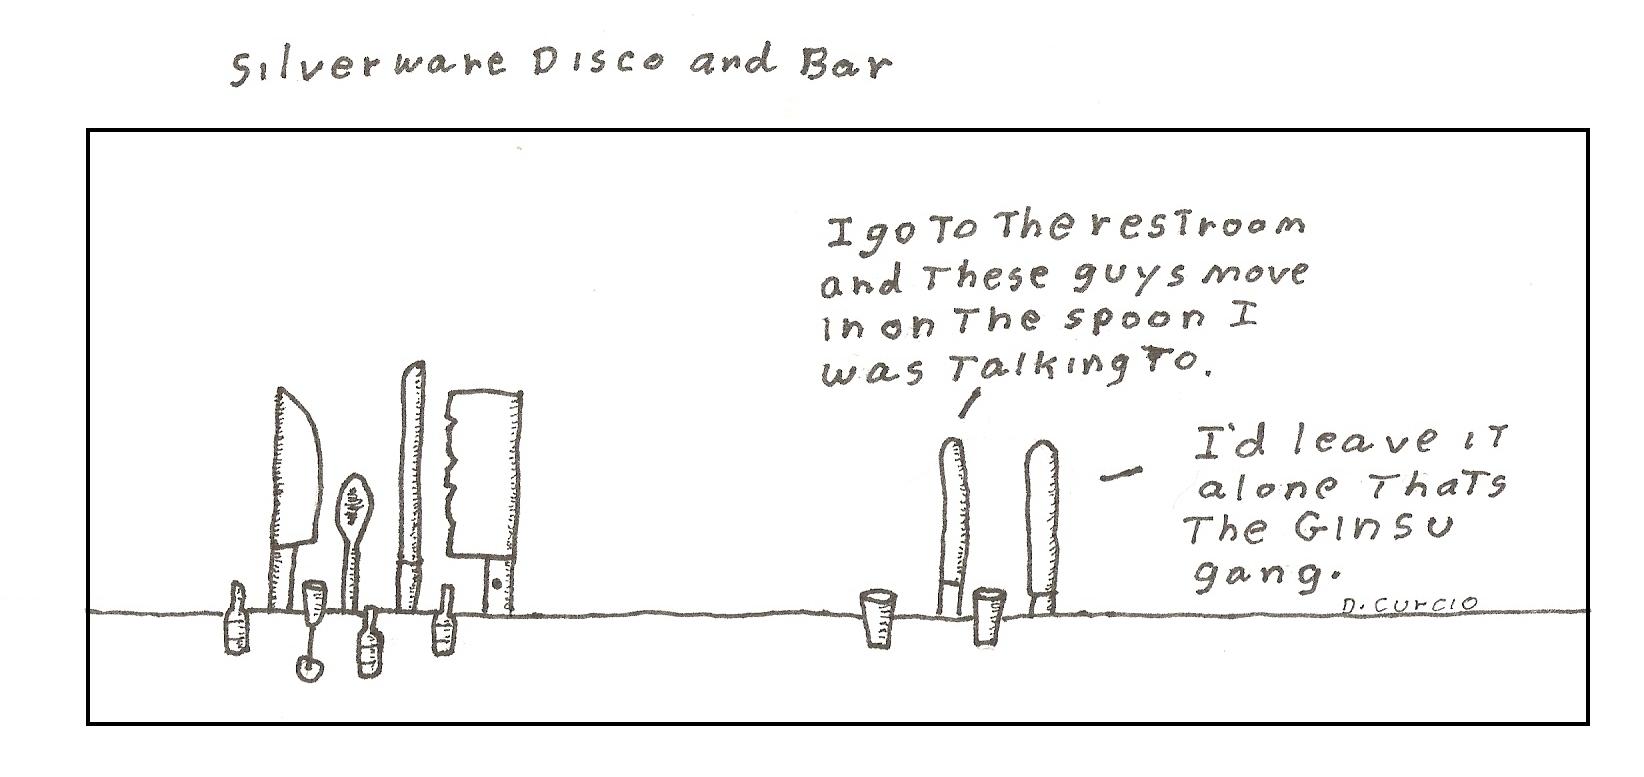 Silverware Disco And Bar 4